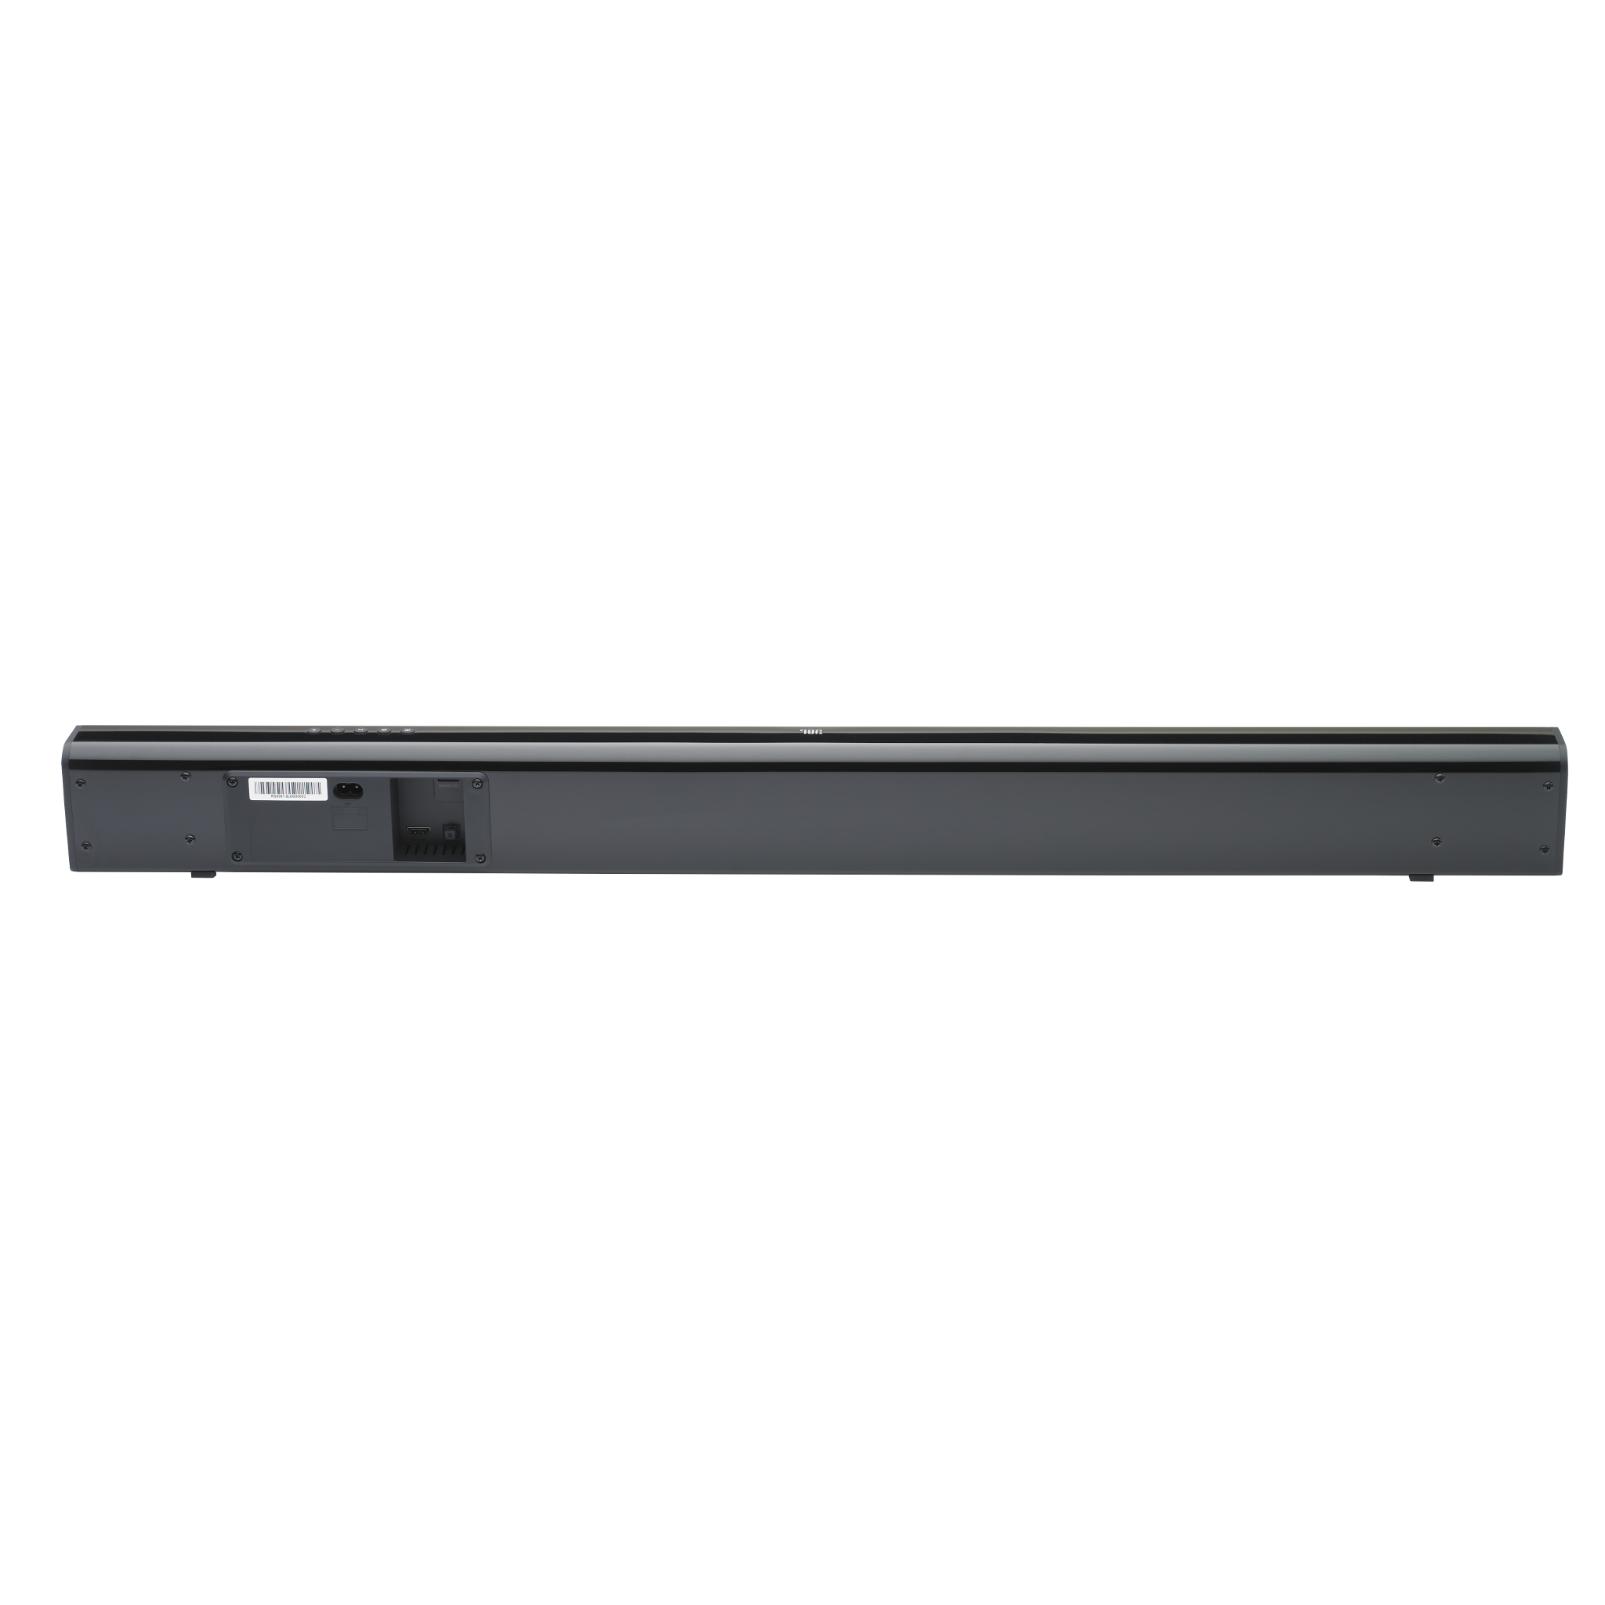 JBL Cinema SB110 - Black - 2.0 channel soundbar - Back